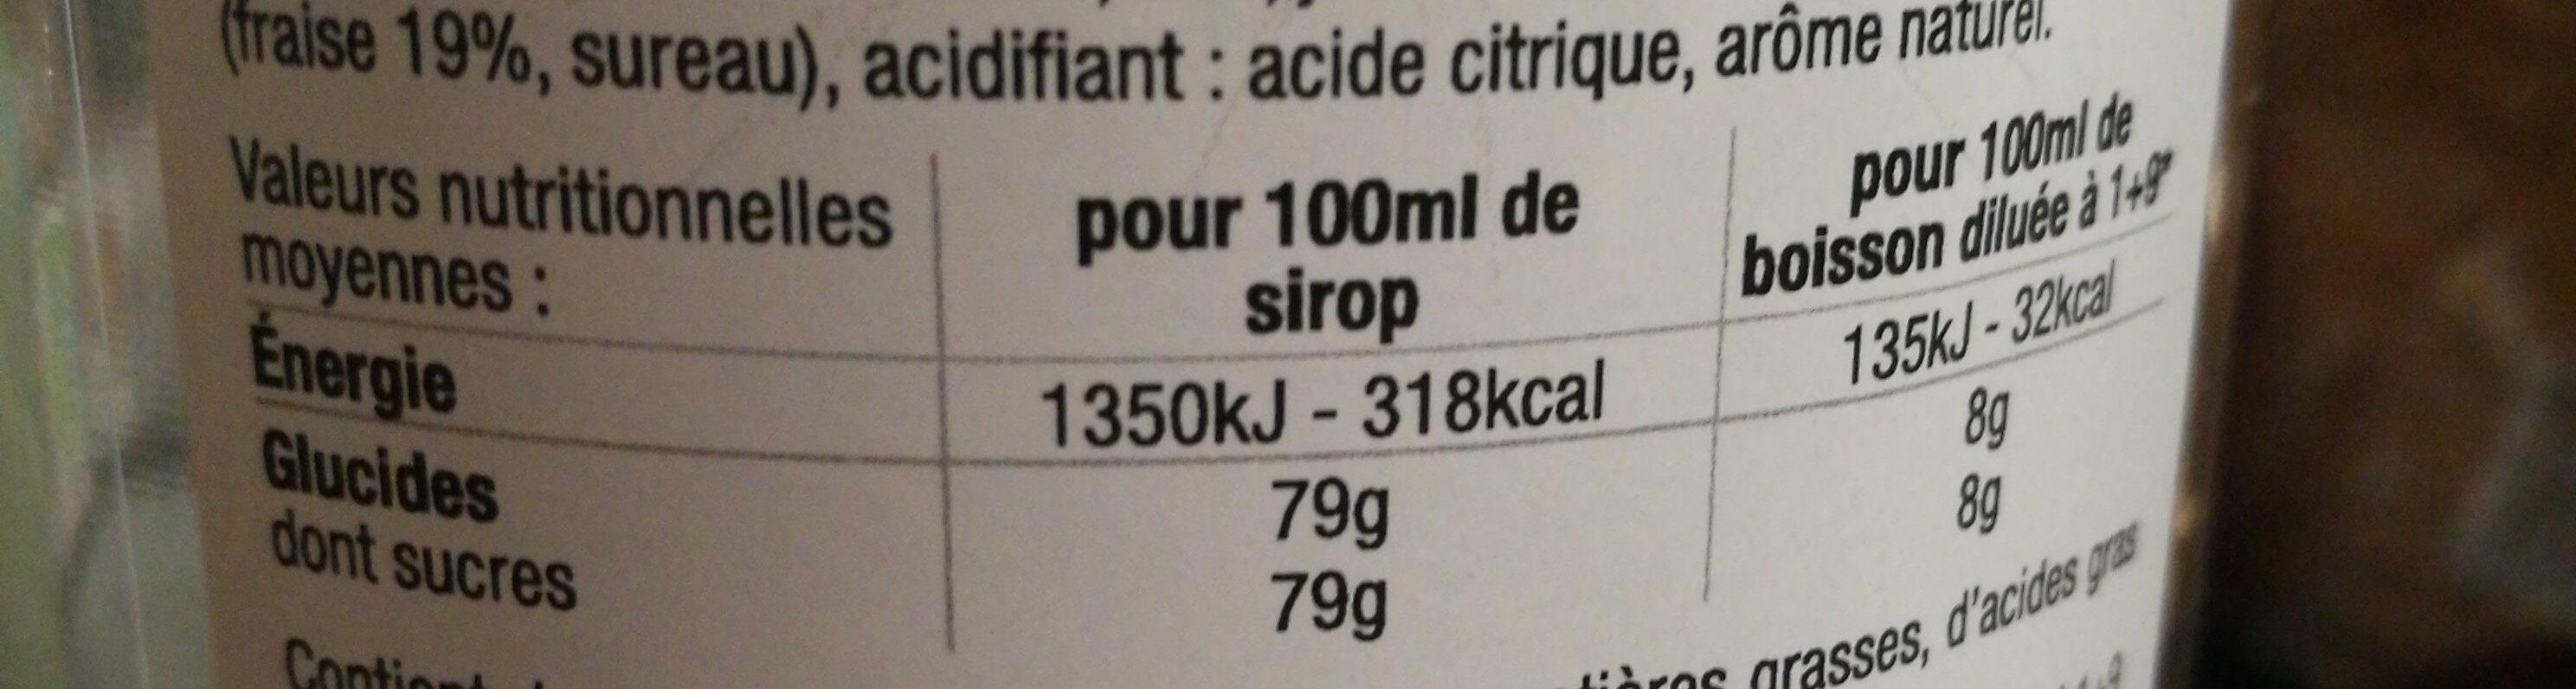 Eyguebelle - Sirop De Fraise 100 CL - Informations nutritionnelles - fr